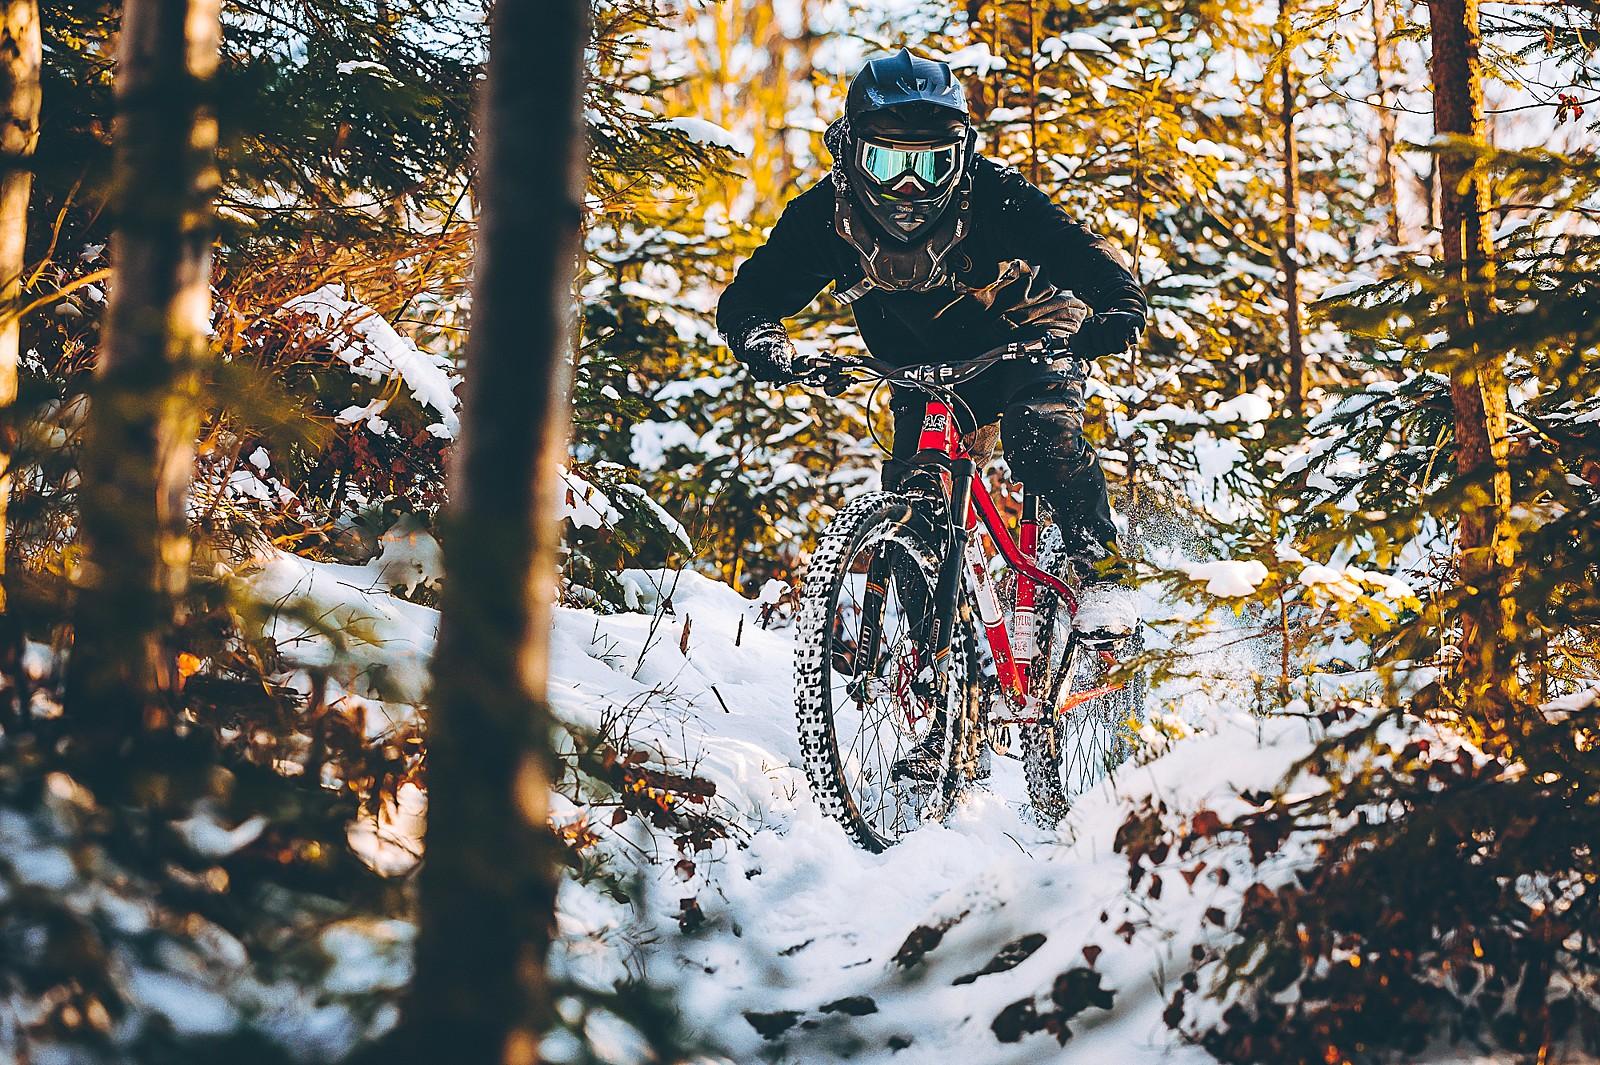 snow fun - Banan - Mountain Biking Pictures - Vital MTB